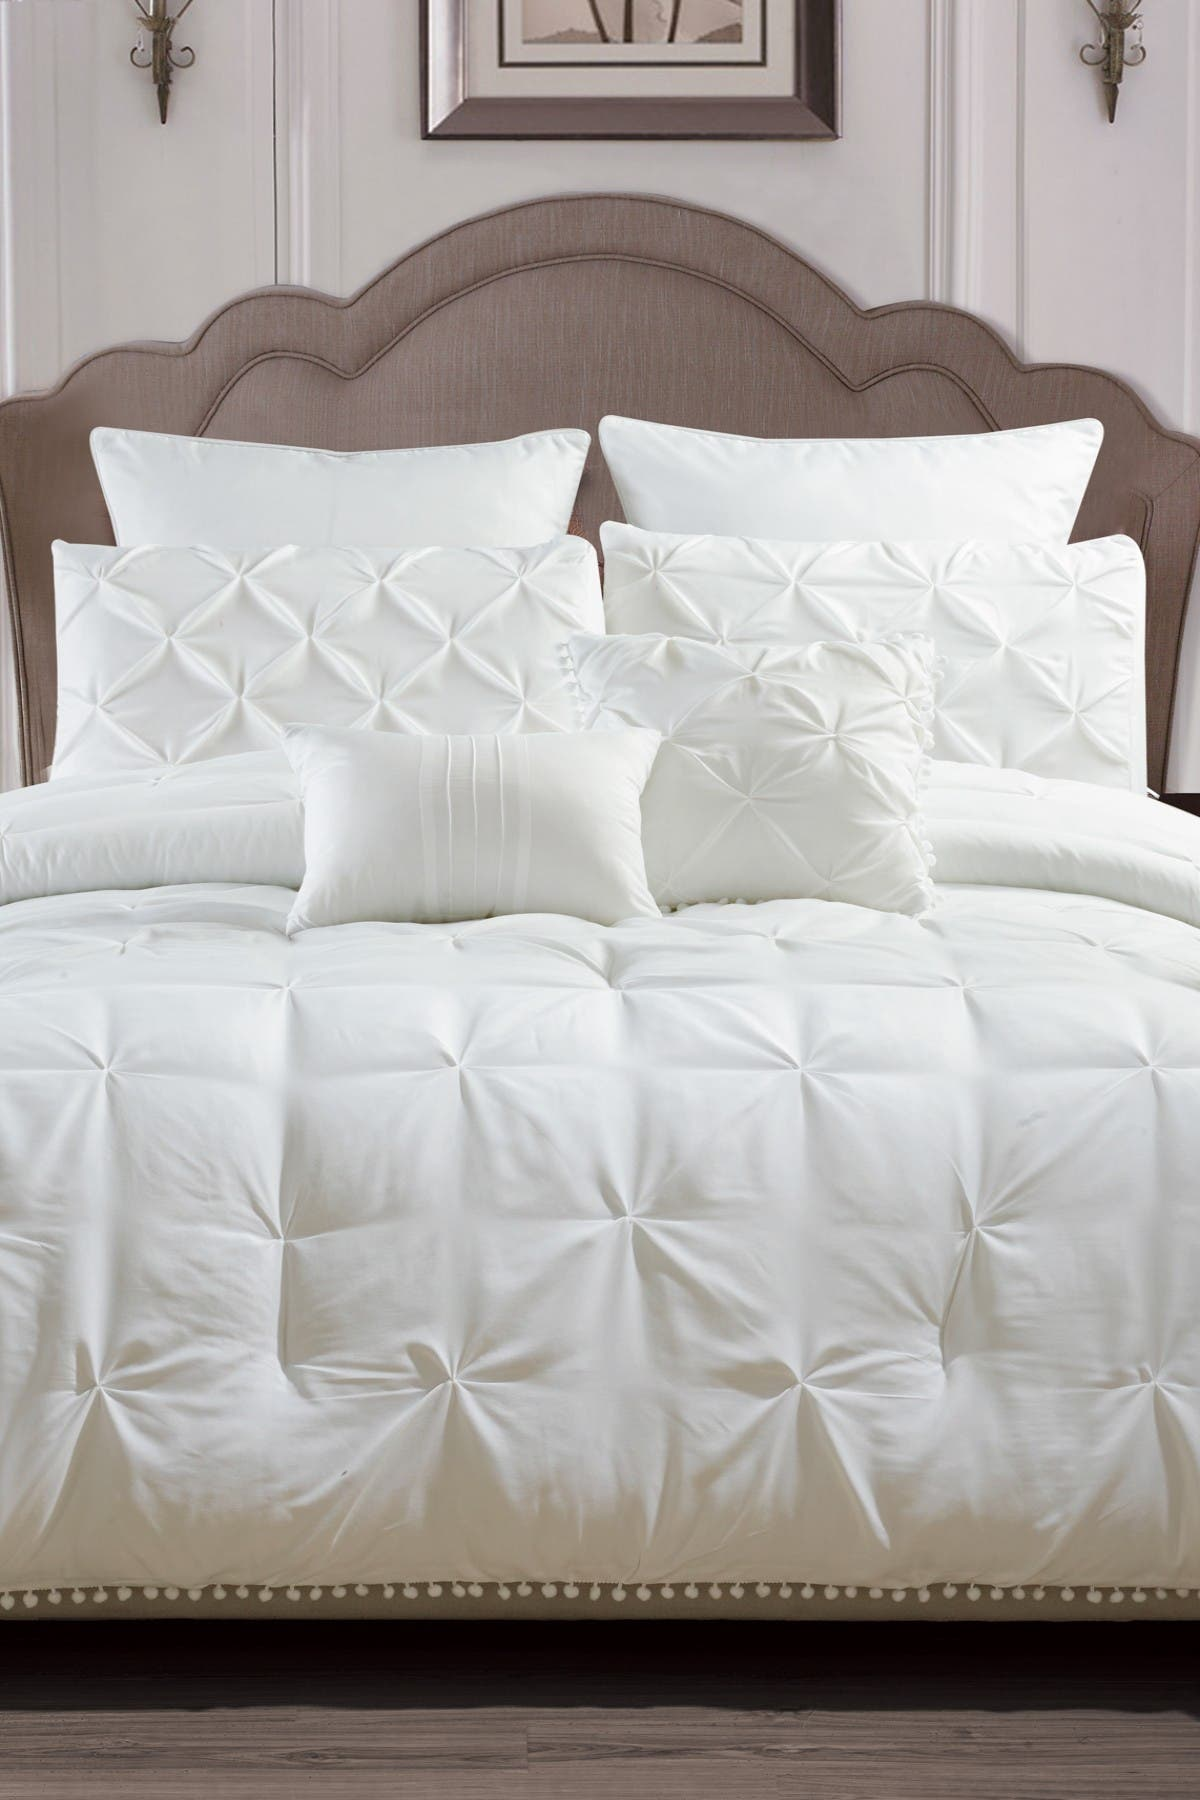 Duck River Textile Esmalinda 7 Piece King Comforter Set White Nordstrom Rack